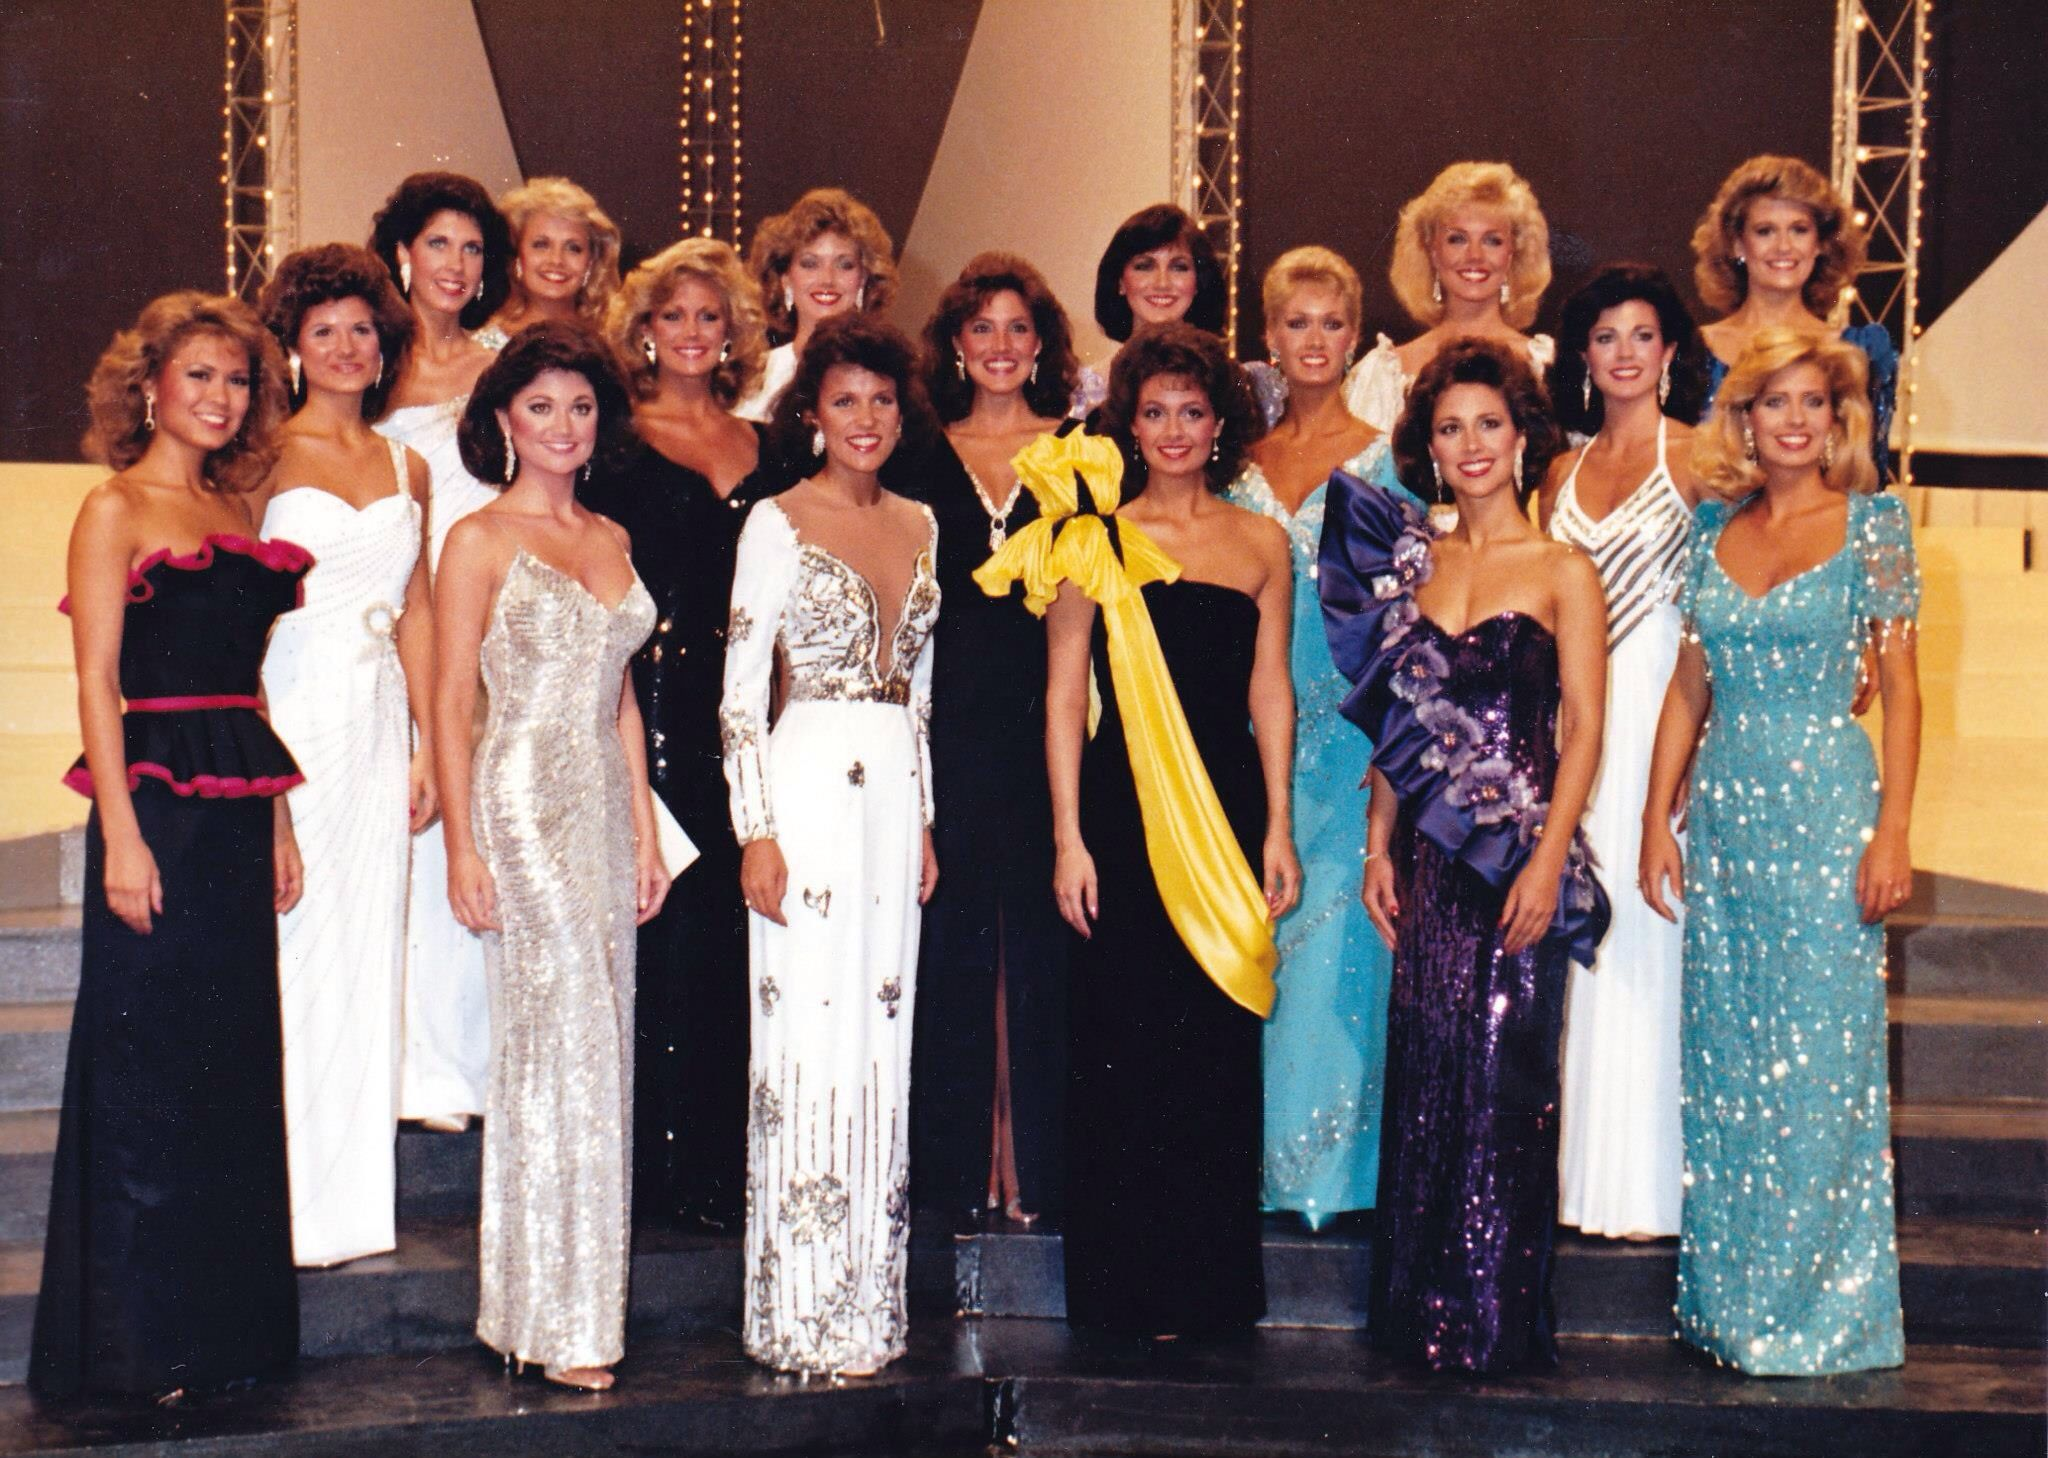 Miss America Contestants In Evening Gown In 1985 [ 1458 x 2048 Pixel ]